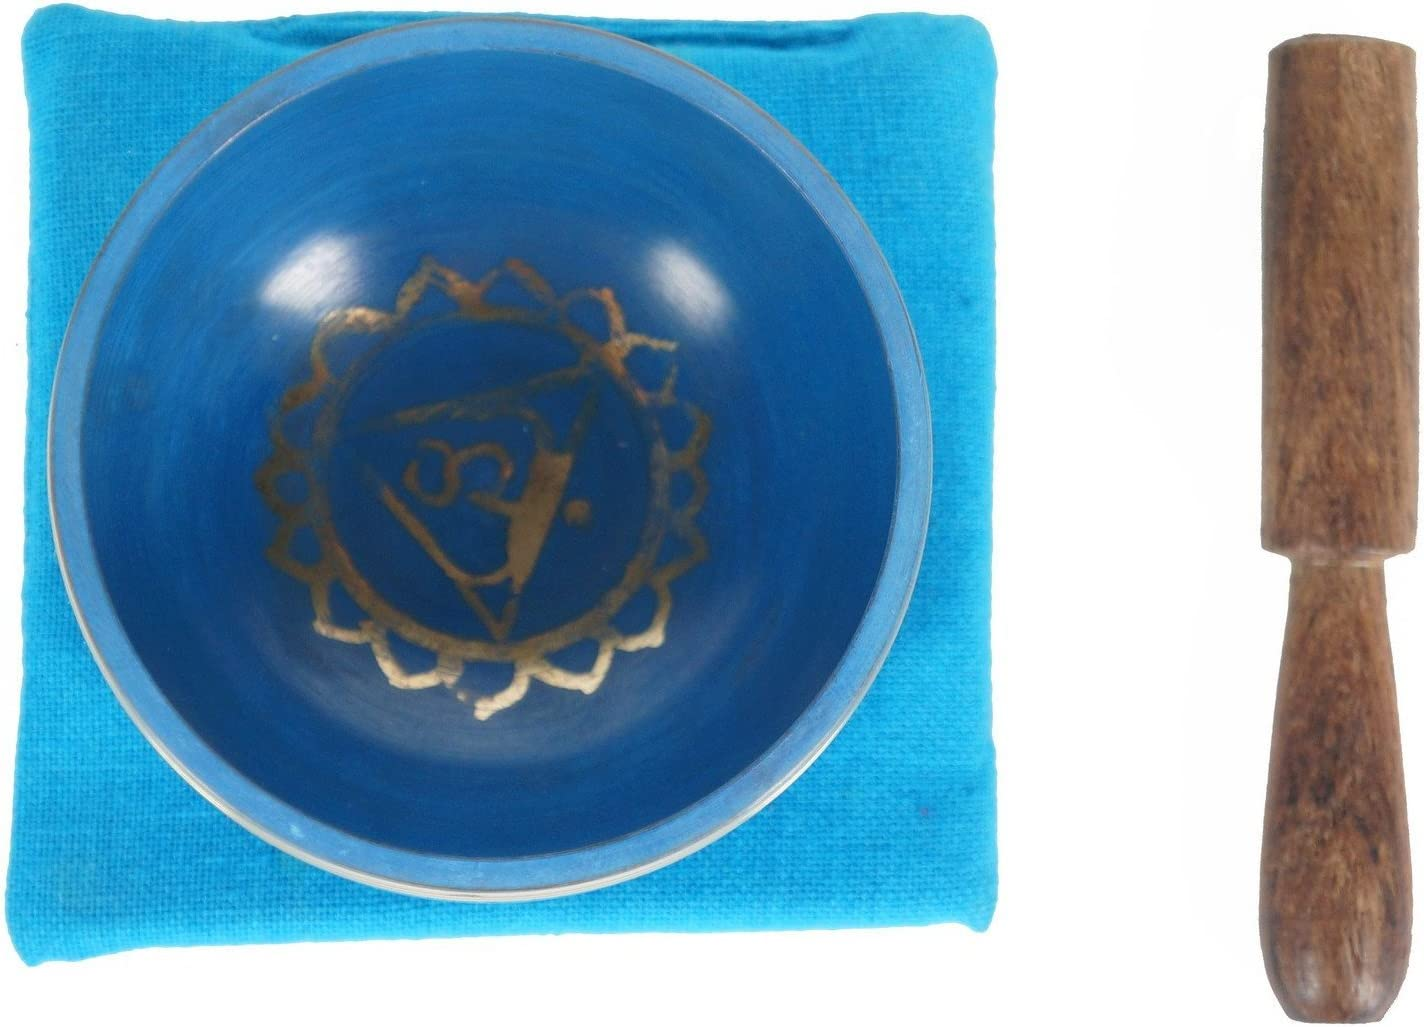 JIVE Tibetan Singing Bowl Palm Size SACRAL Chakra Premium Singing Bowl Gift Set SACRAL Chakra JIVE FEDERAL TRADEMARK BRAND